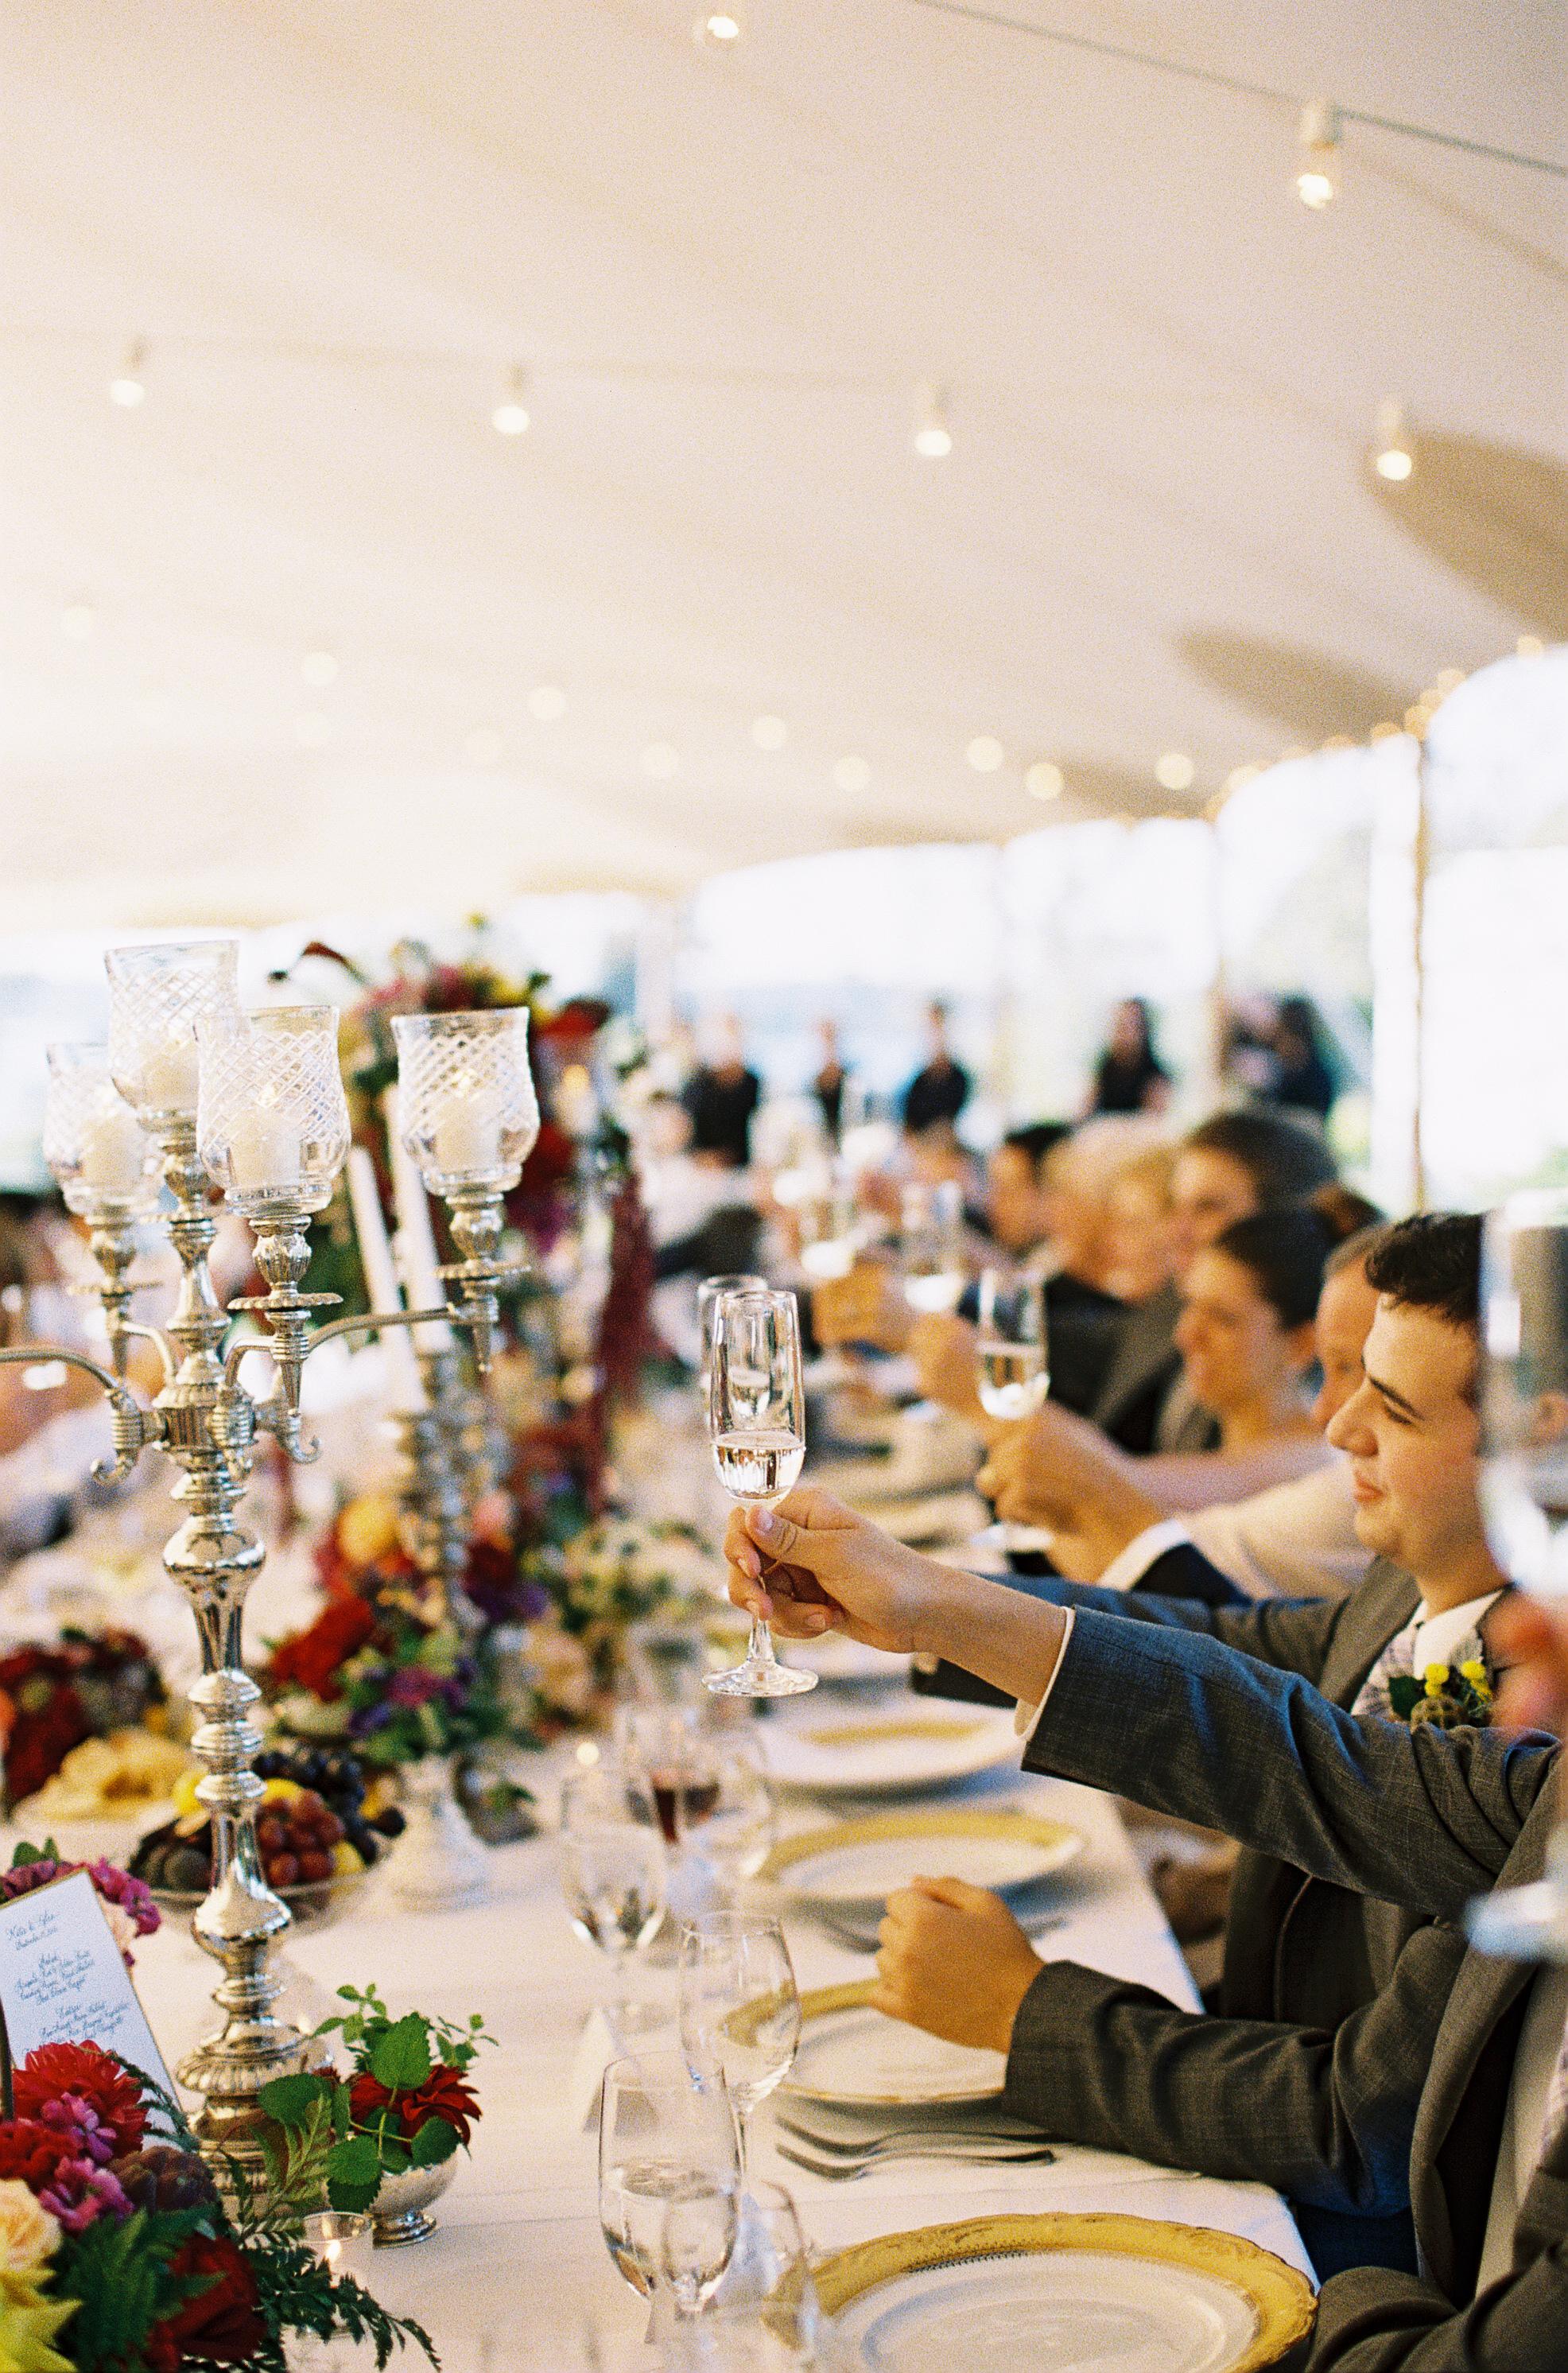 chebeague_island_inn_wedding_gabe_aceves033.JPG